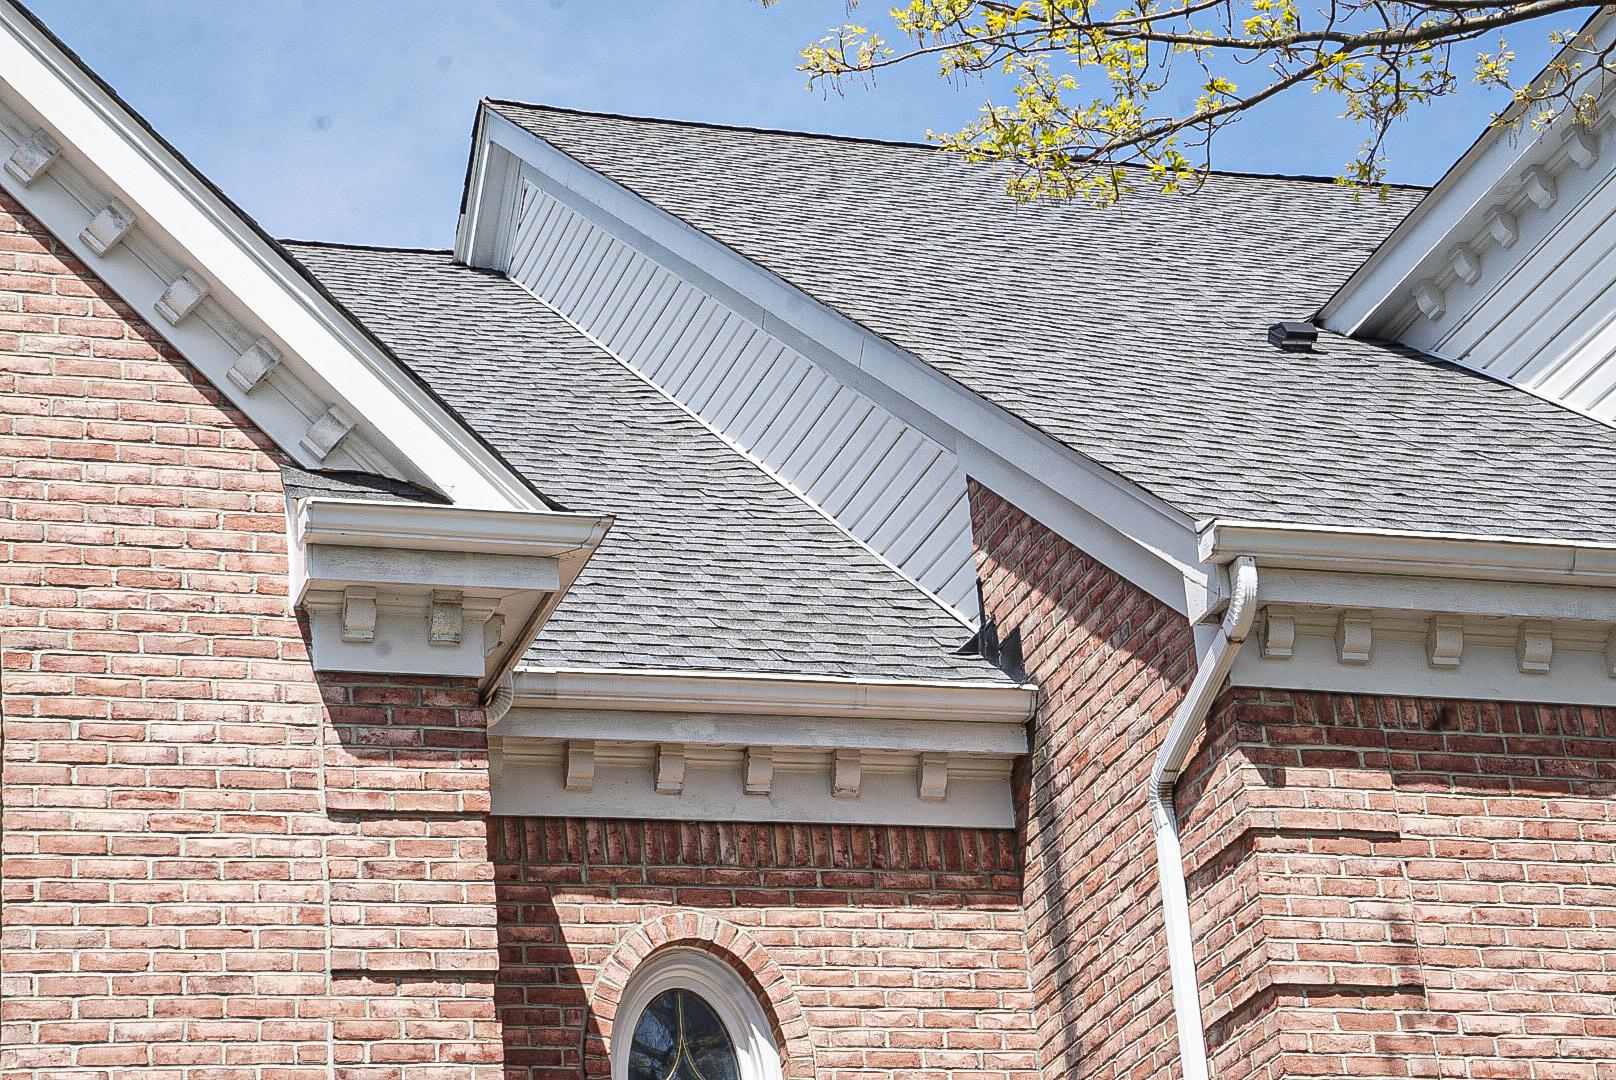 Canonsburg Condo/HOA Roofing Multifamily